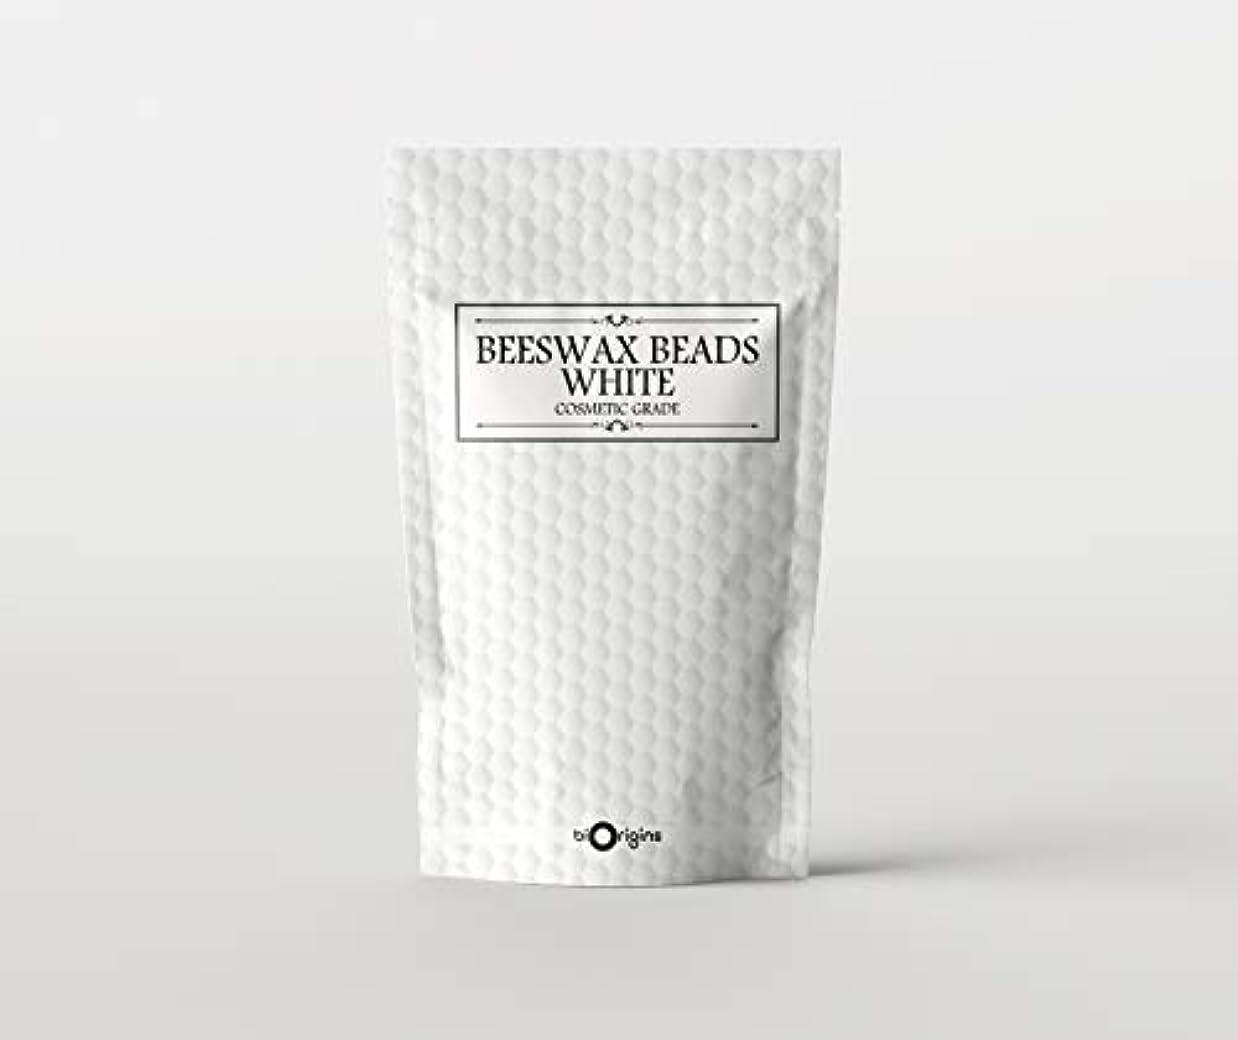 花瓶額階段Beeswax Beads White - Cosmetic Grade - 500g